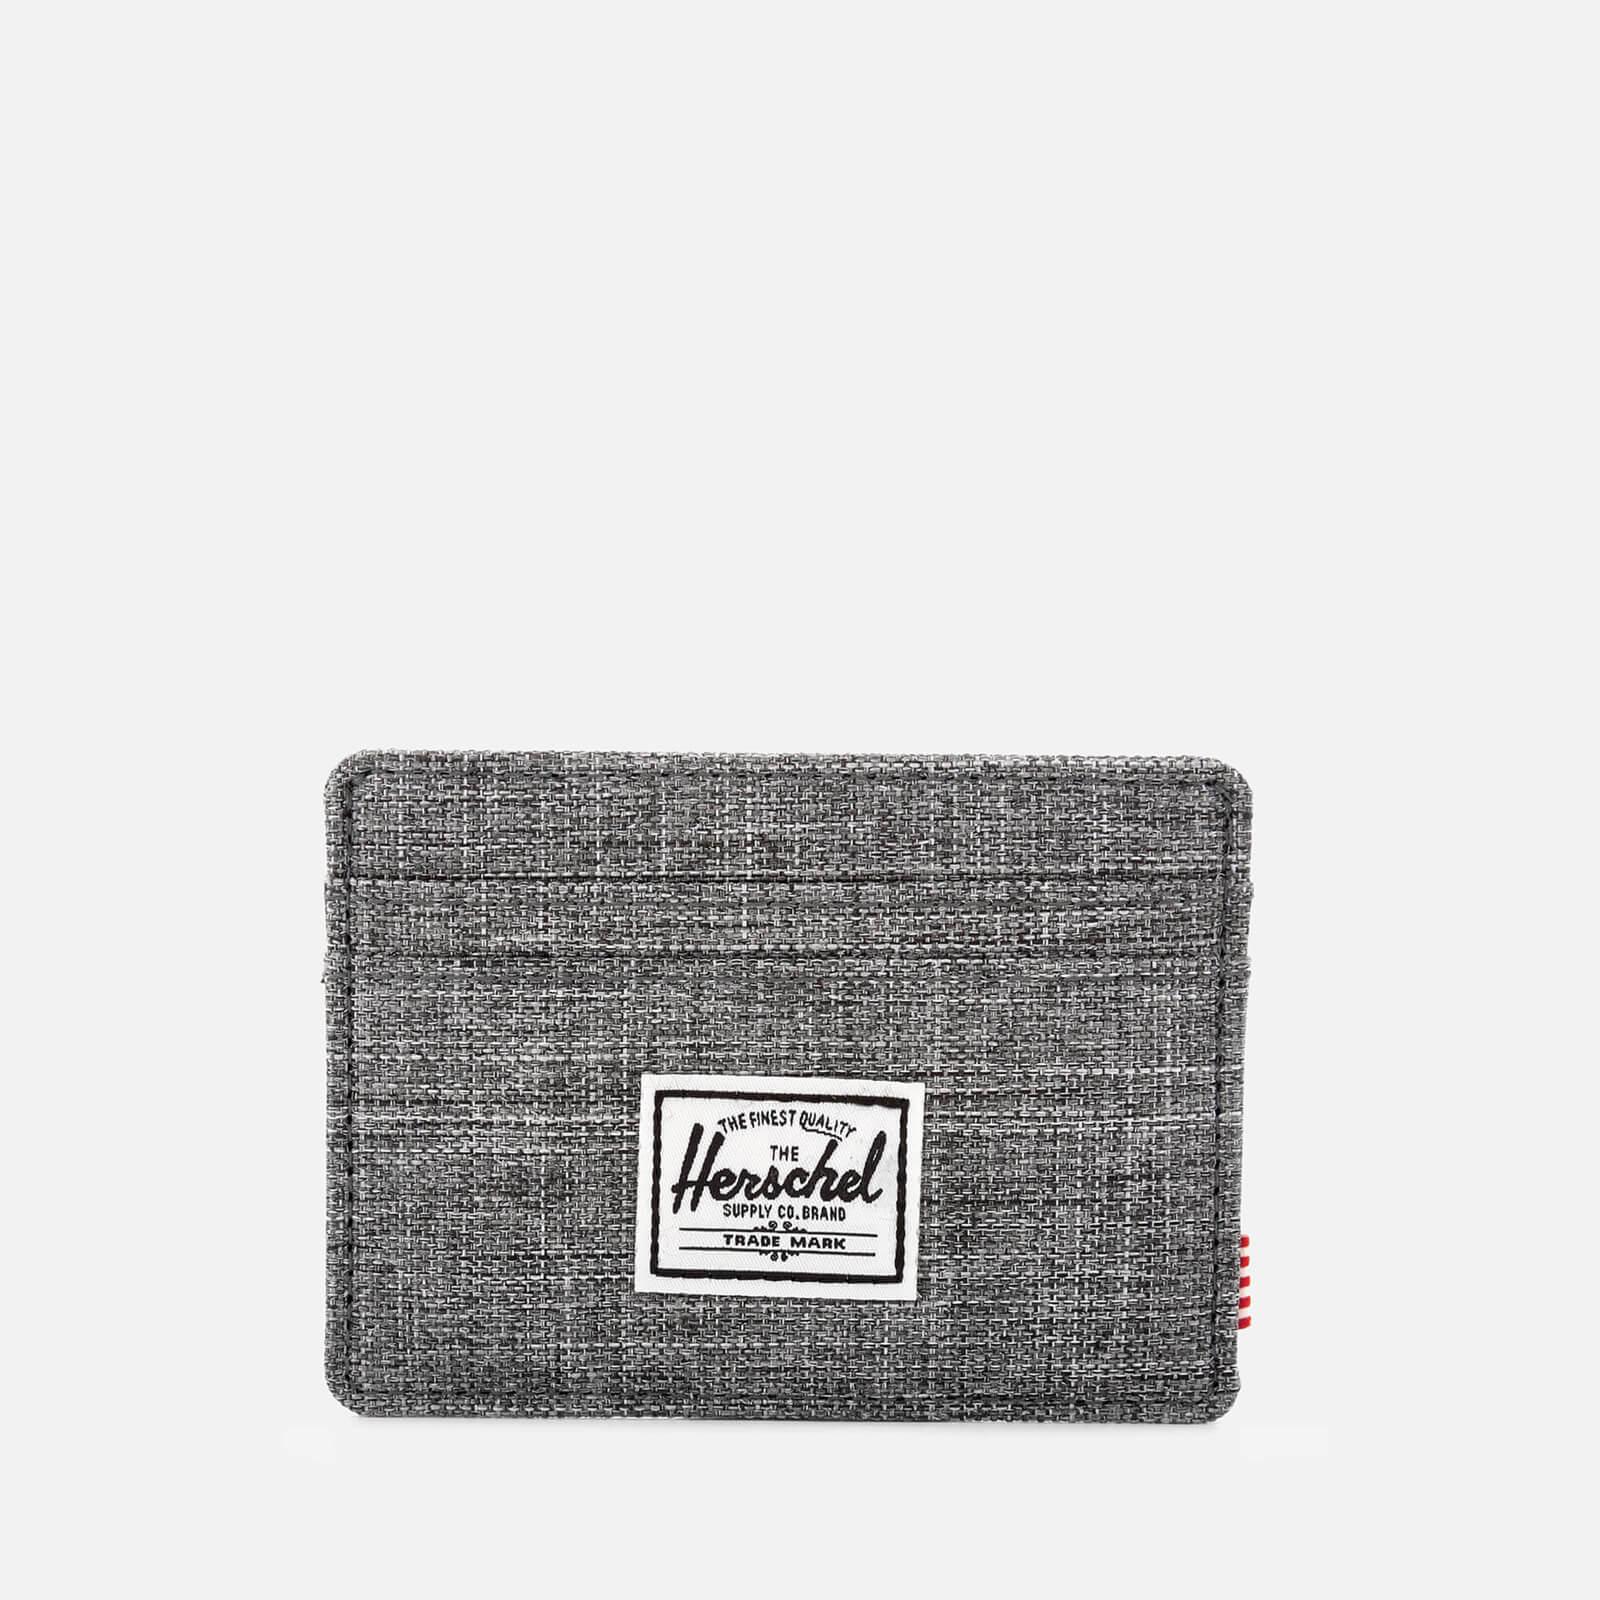 9d554e2828f Herschel Supply Co. Men s Charlie Card Holder - Raven Crosshatch Clothing